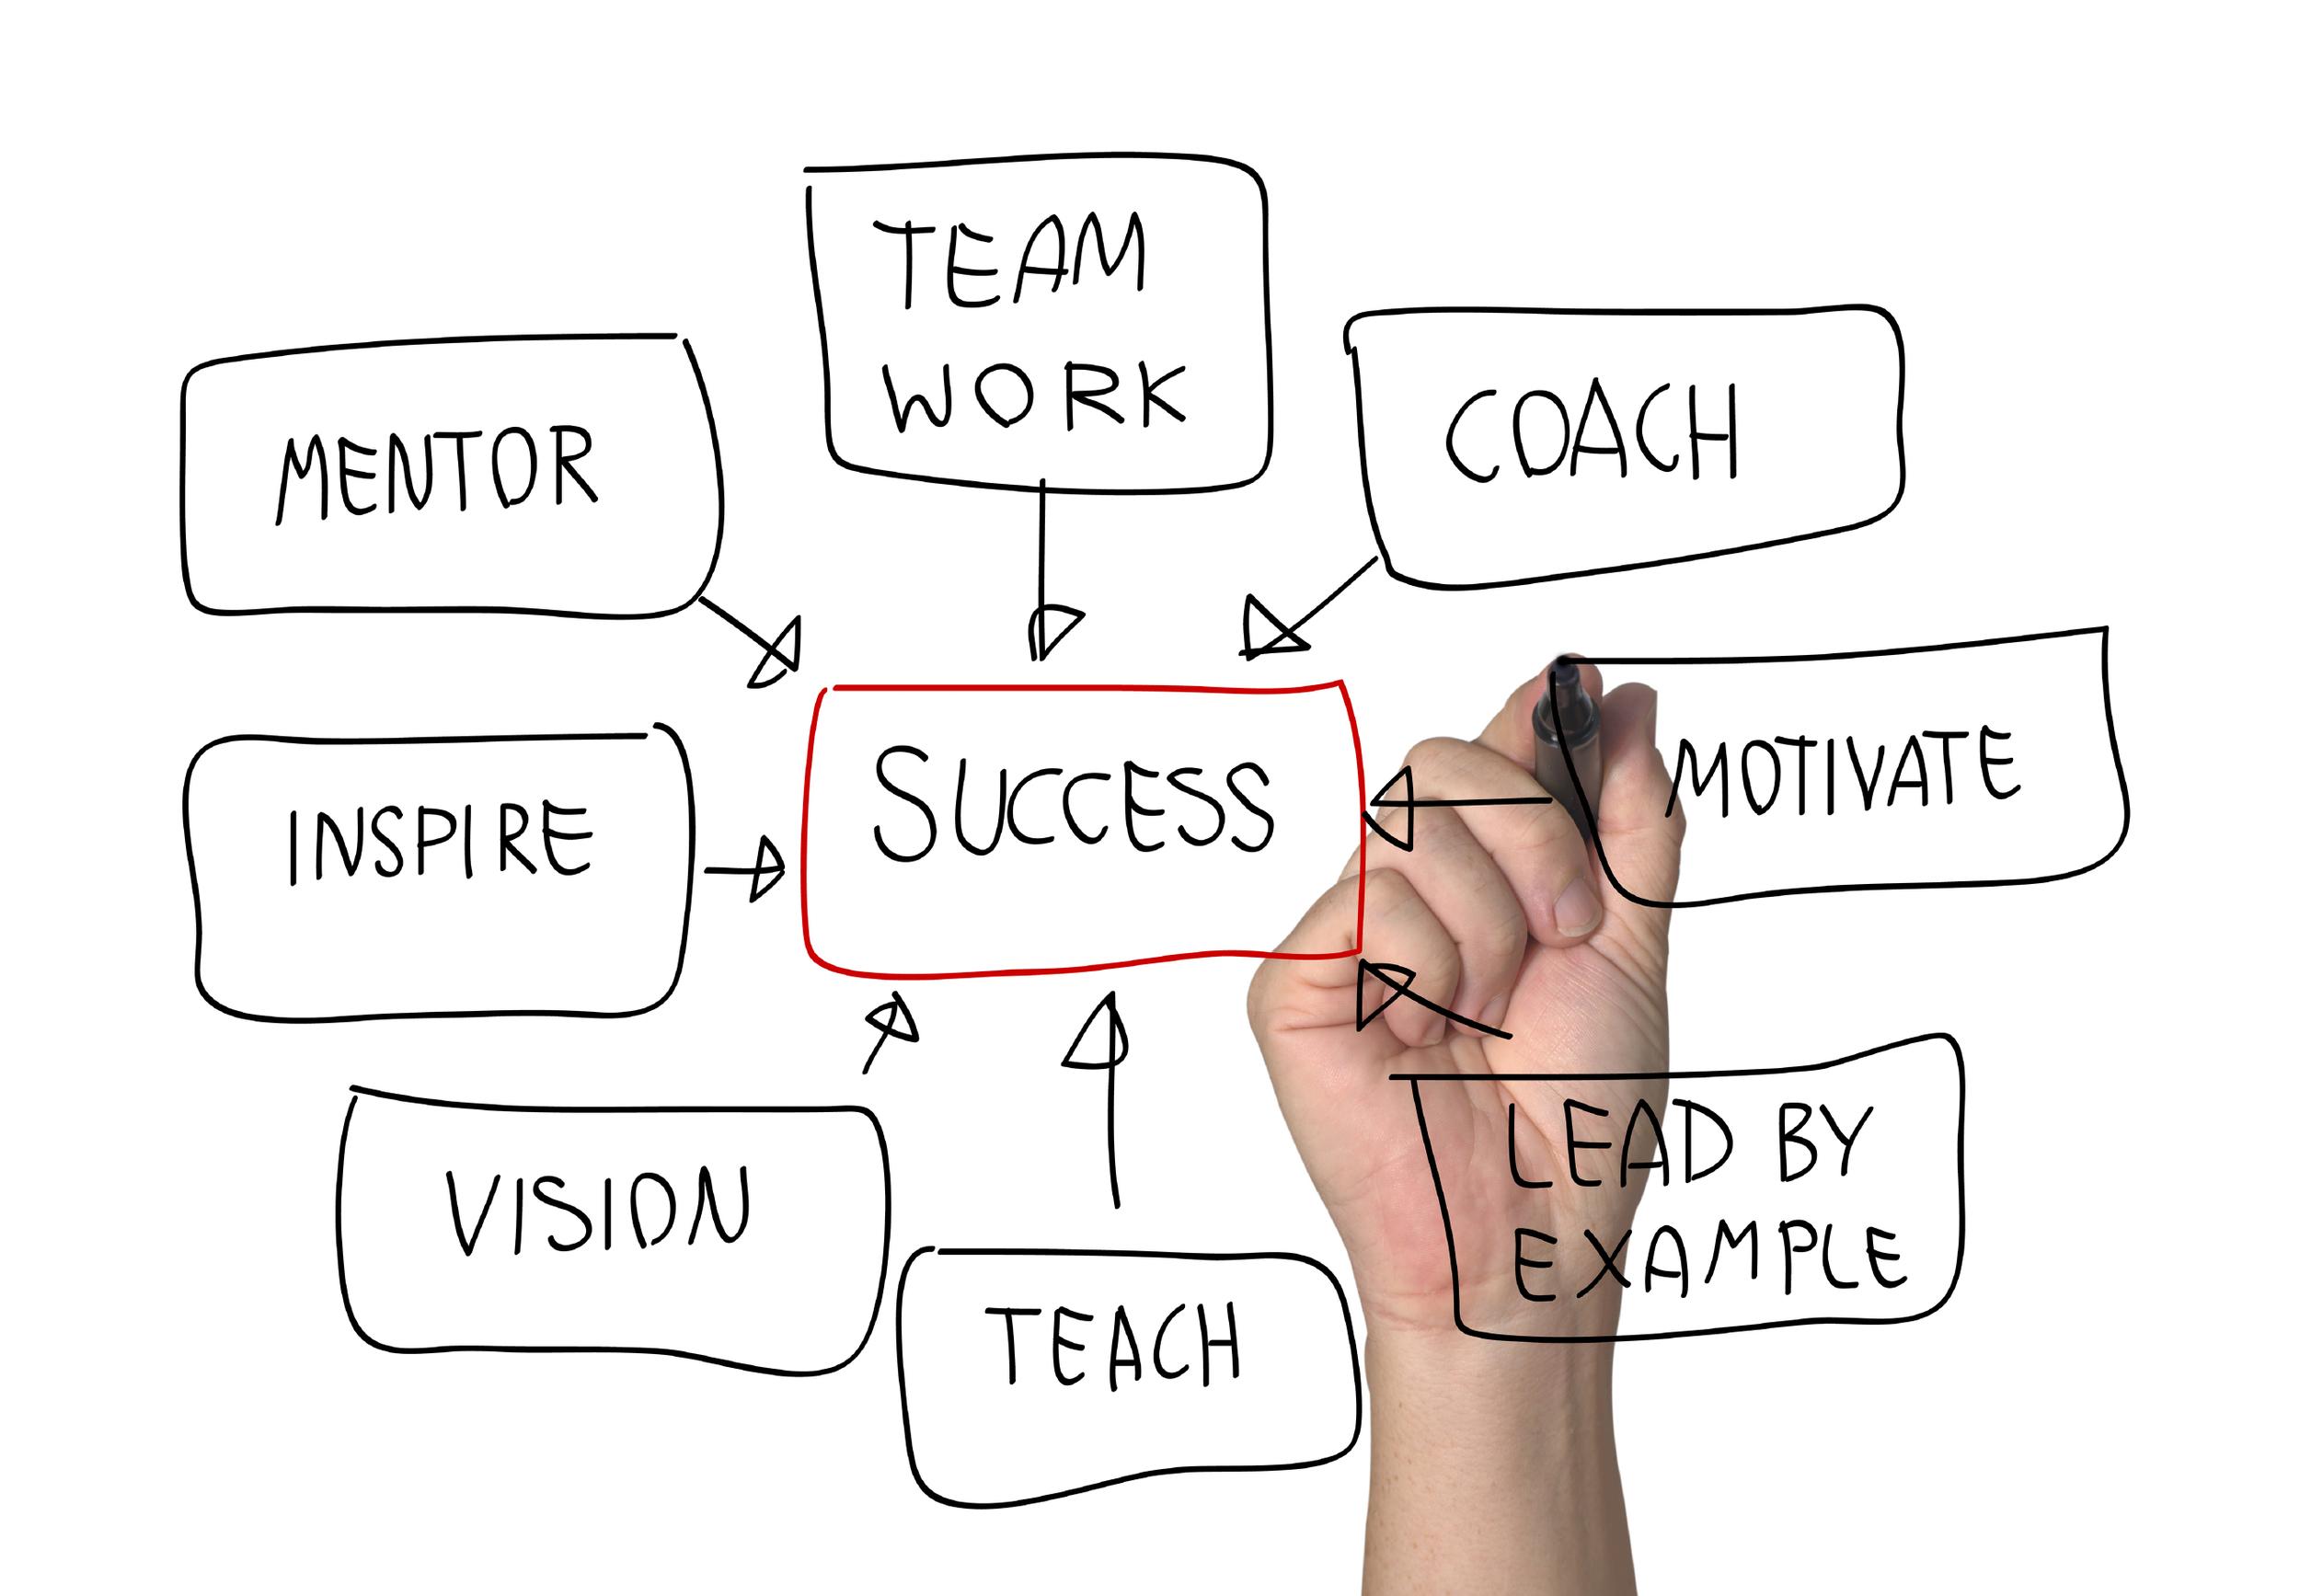 coaching-and-mentoring-workshop.jpg